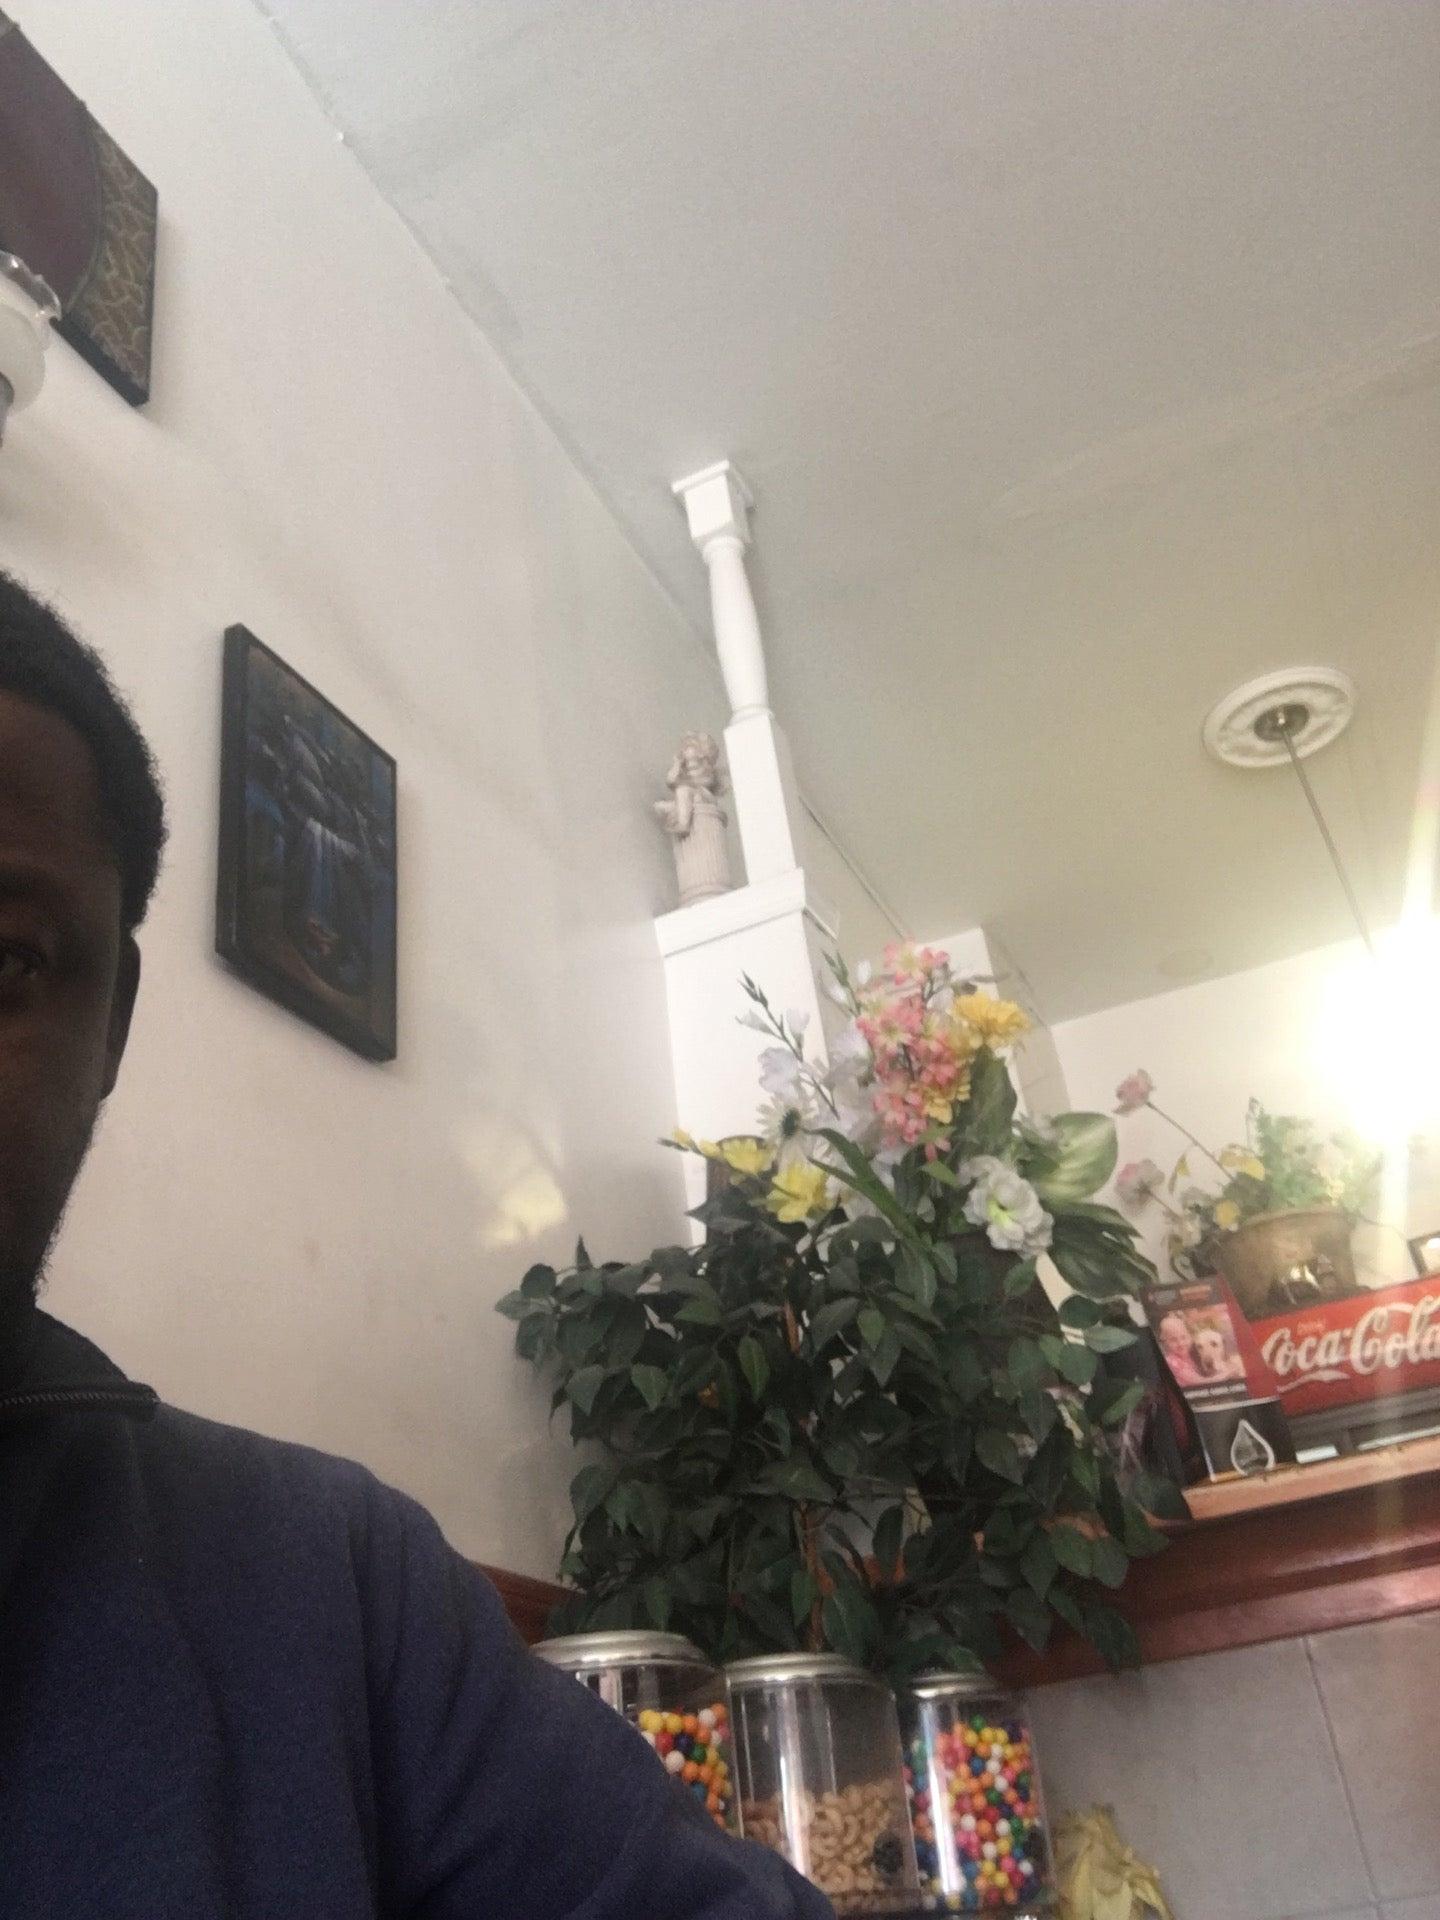 Port Prince Restaurant,haitian food, griot, banane peze, du riz, good food